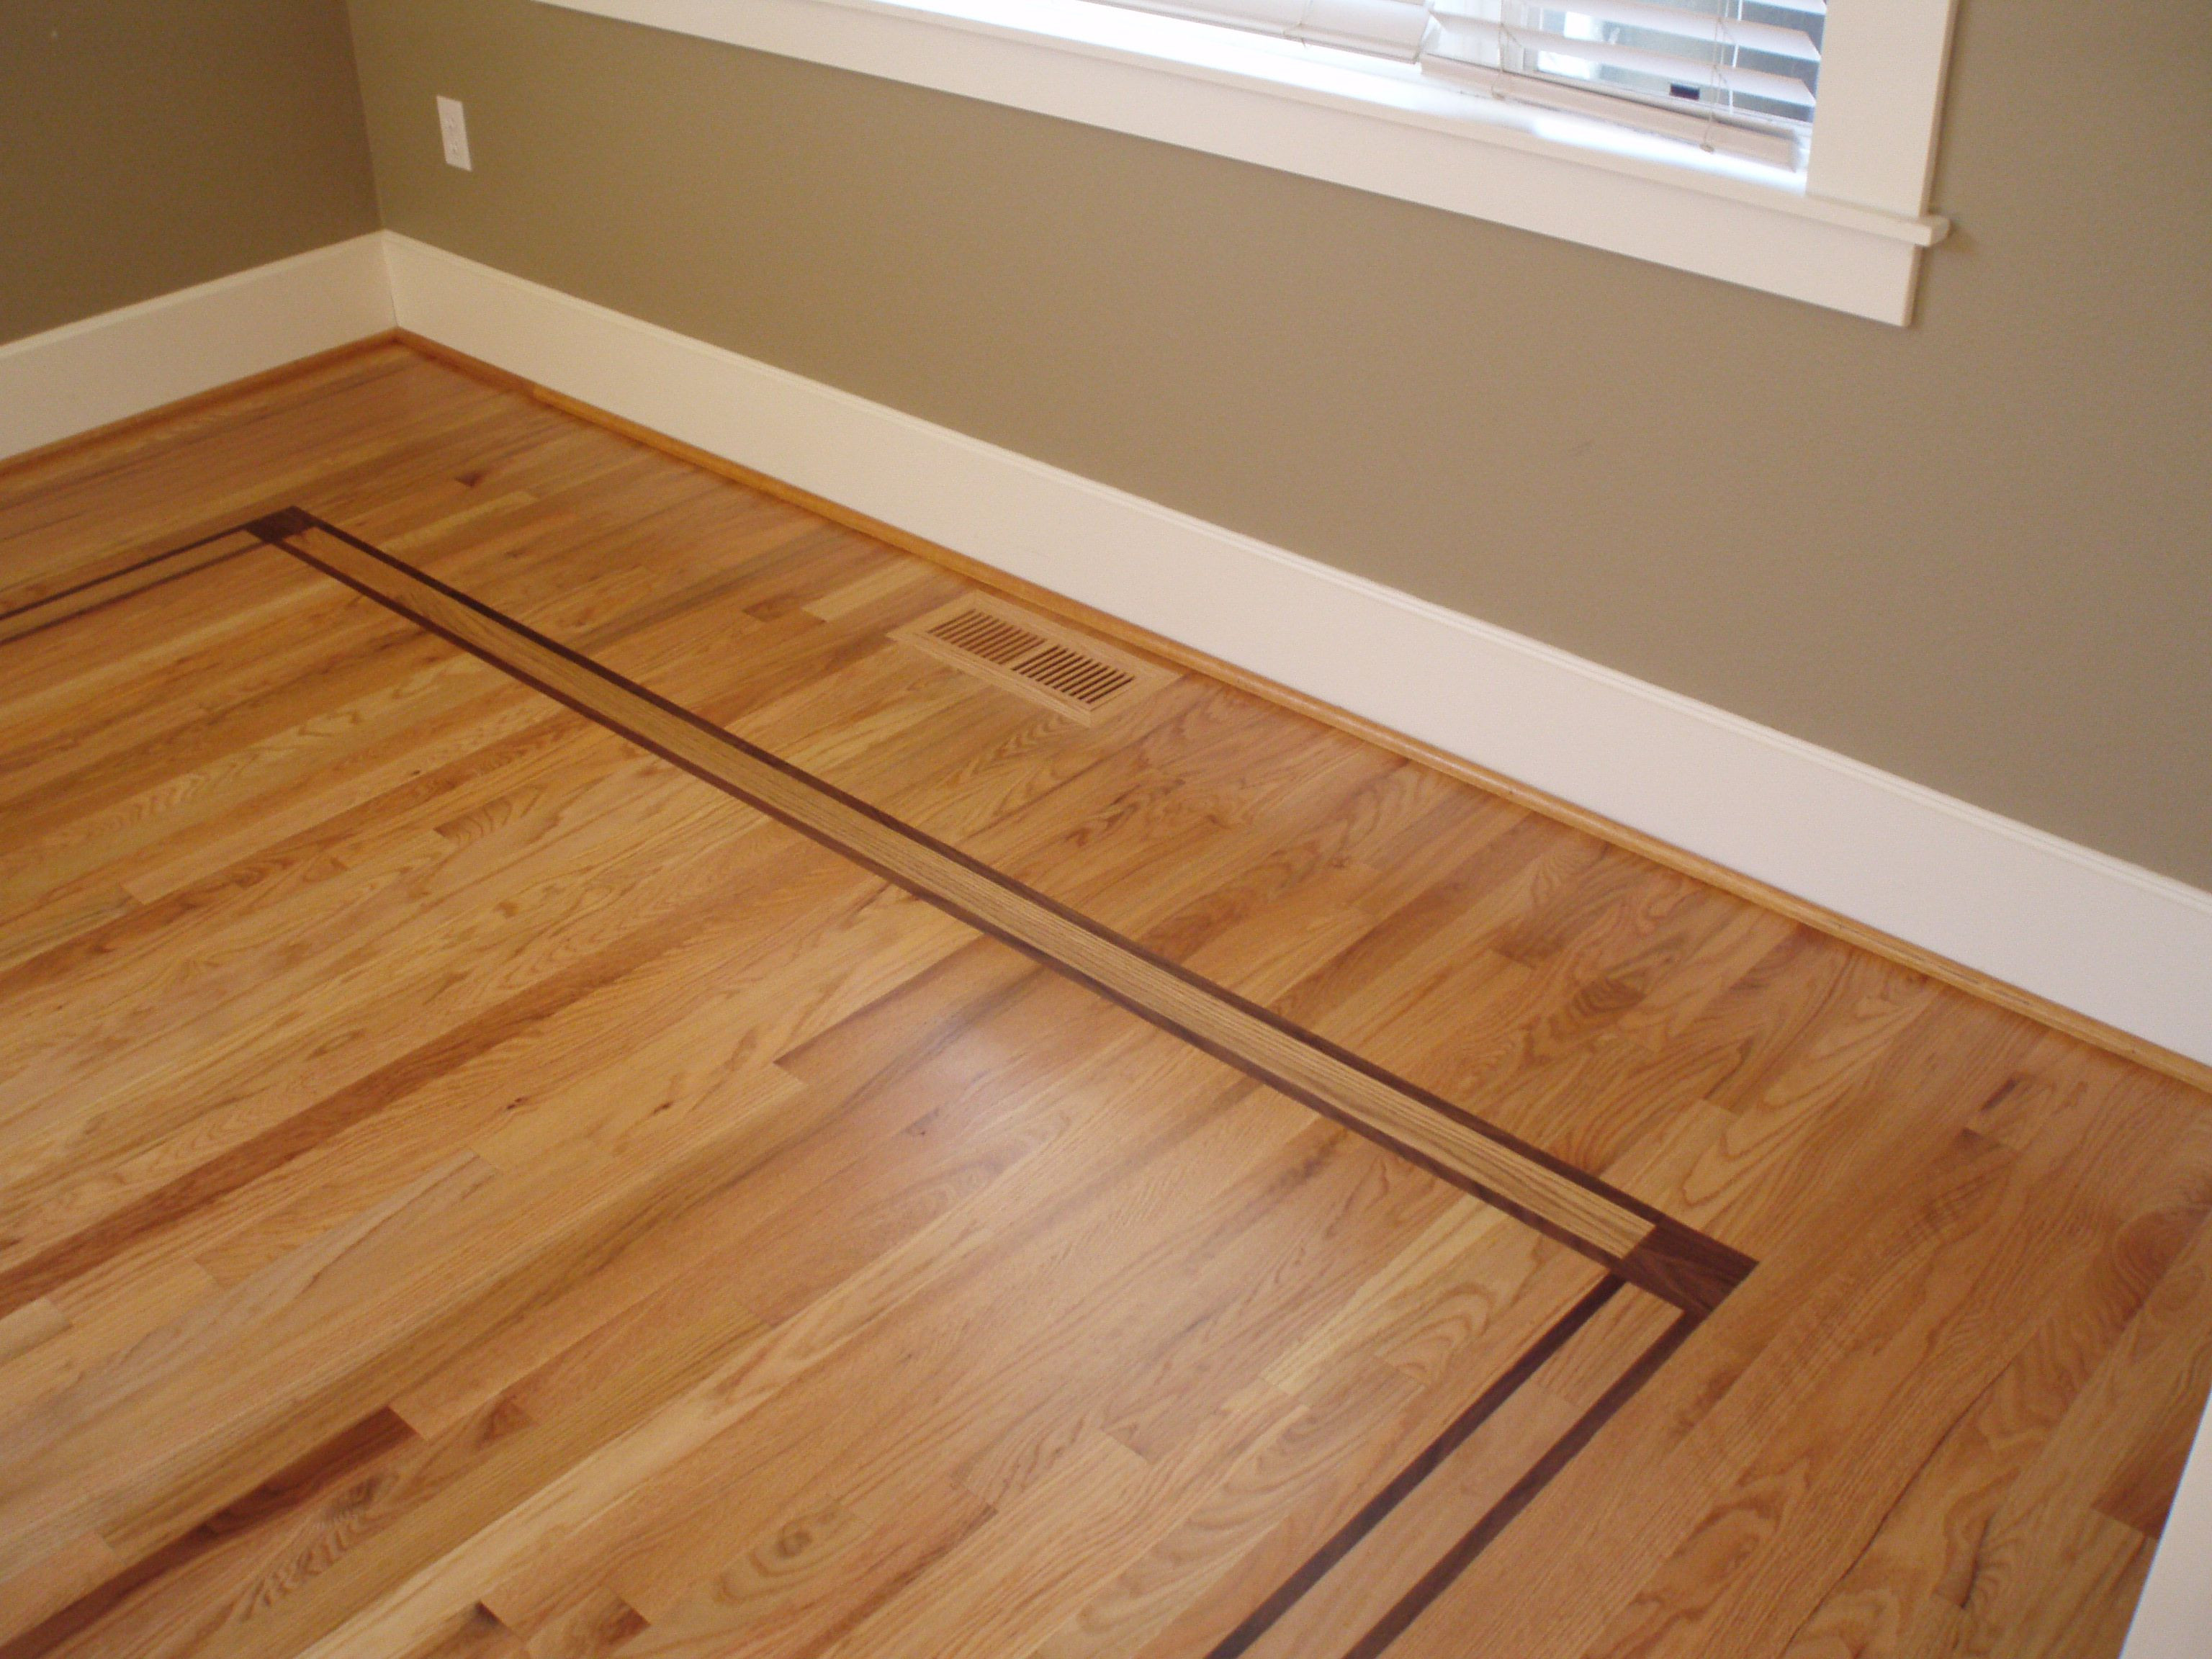 2 inch oak hardwood flooring of inlay of walnut with red oak flooring www dominohardwoodfloors com in inlay of walnut with red oak flooring www dominohardwoodfloors com portland or domino hardwood floors inc